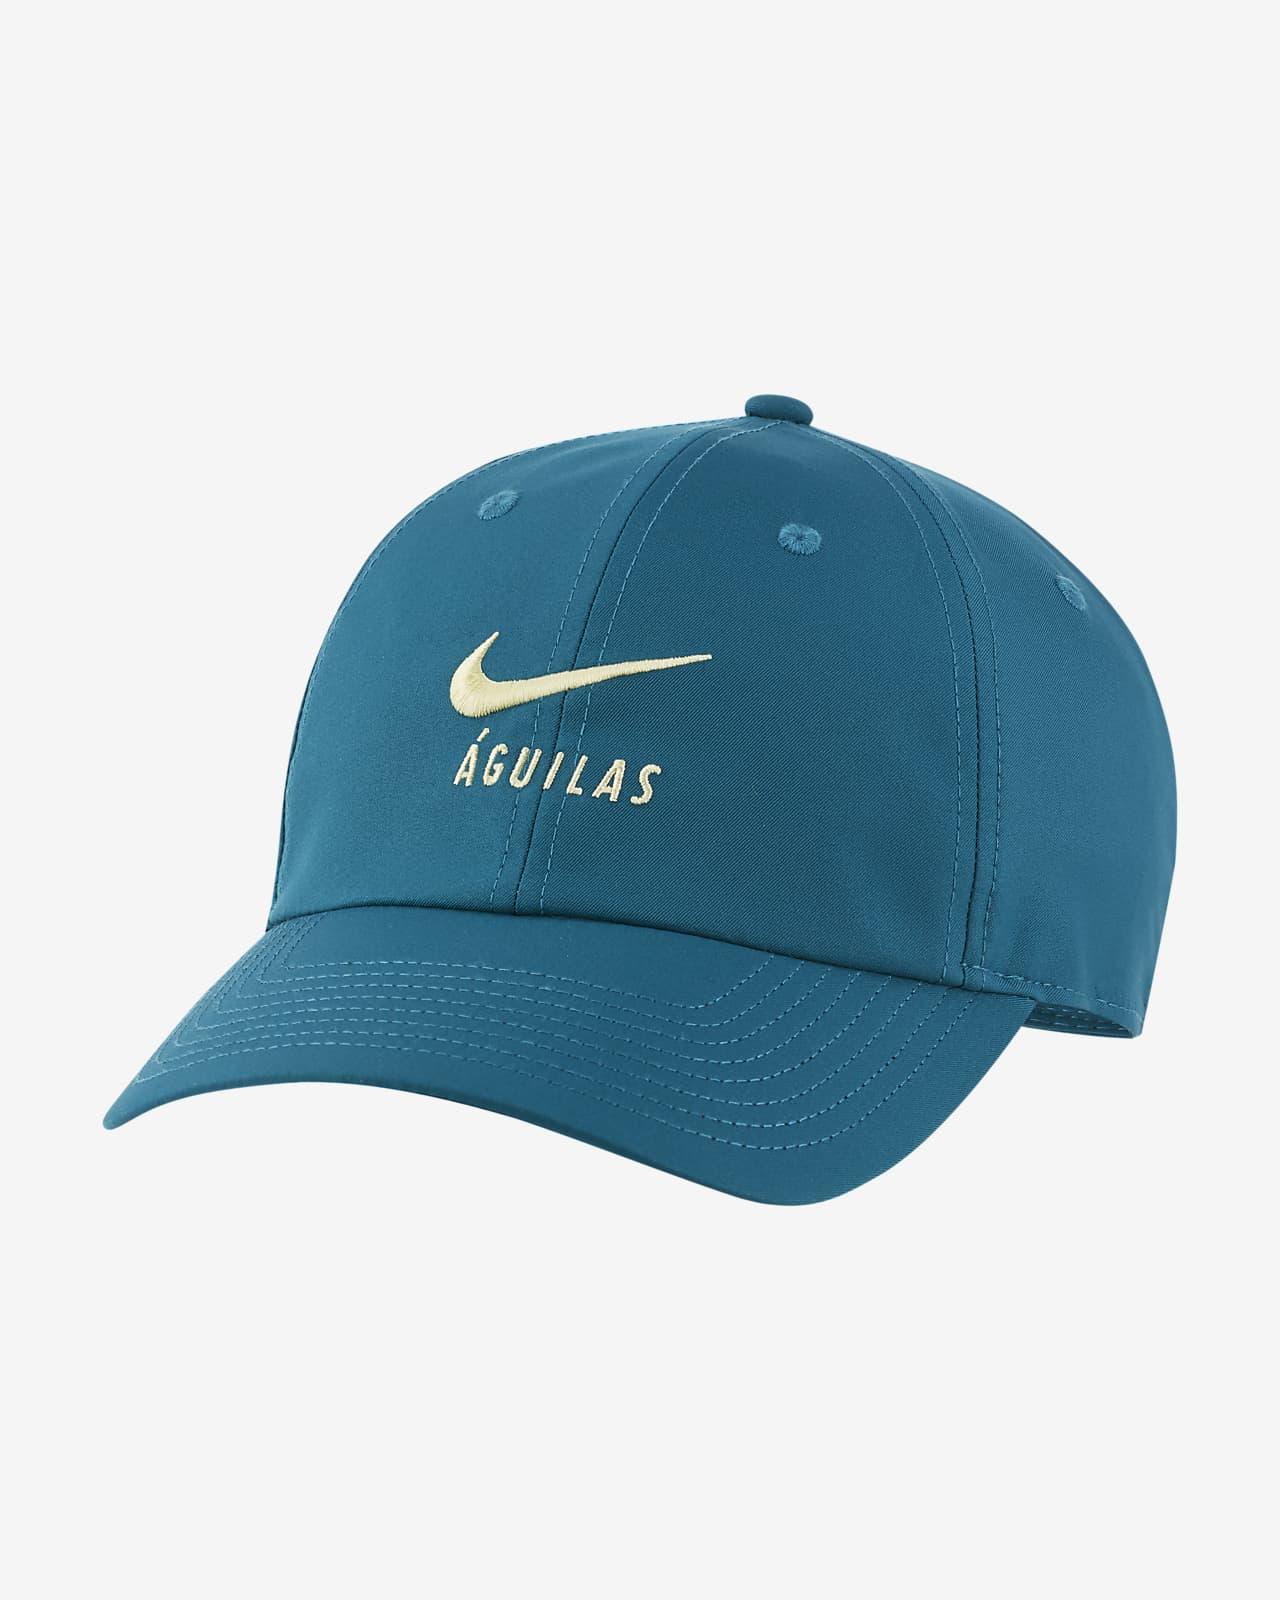 Club América Heritage86 Hat